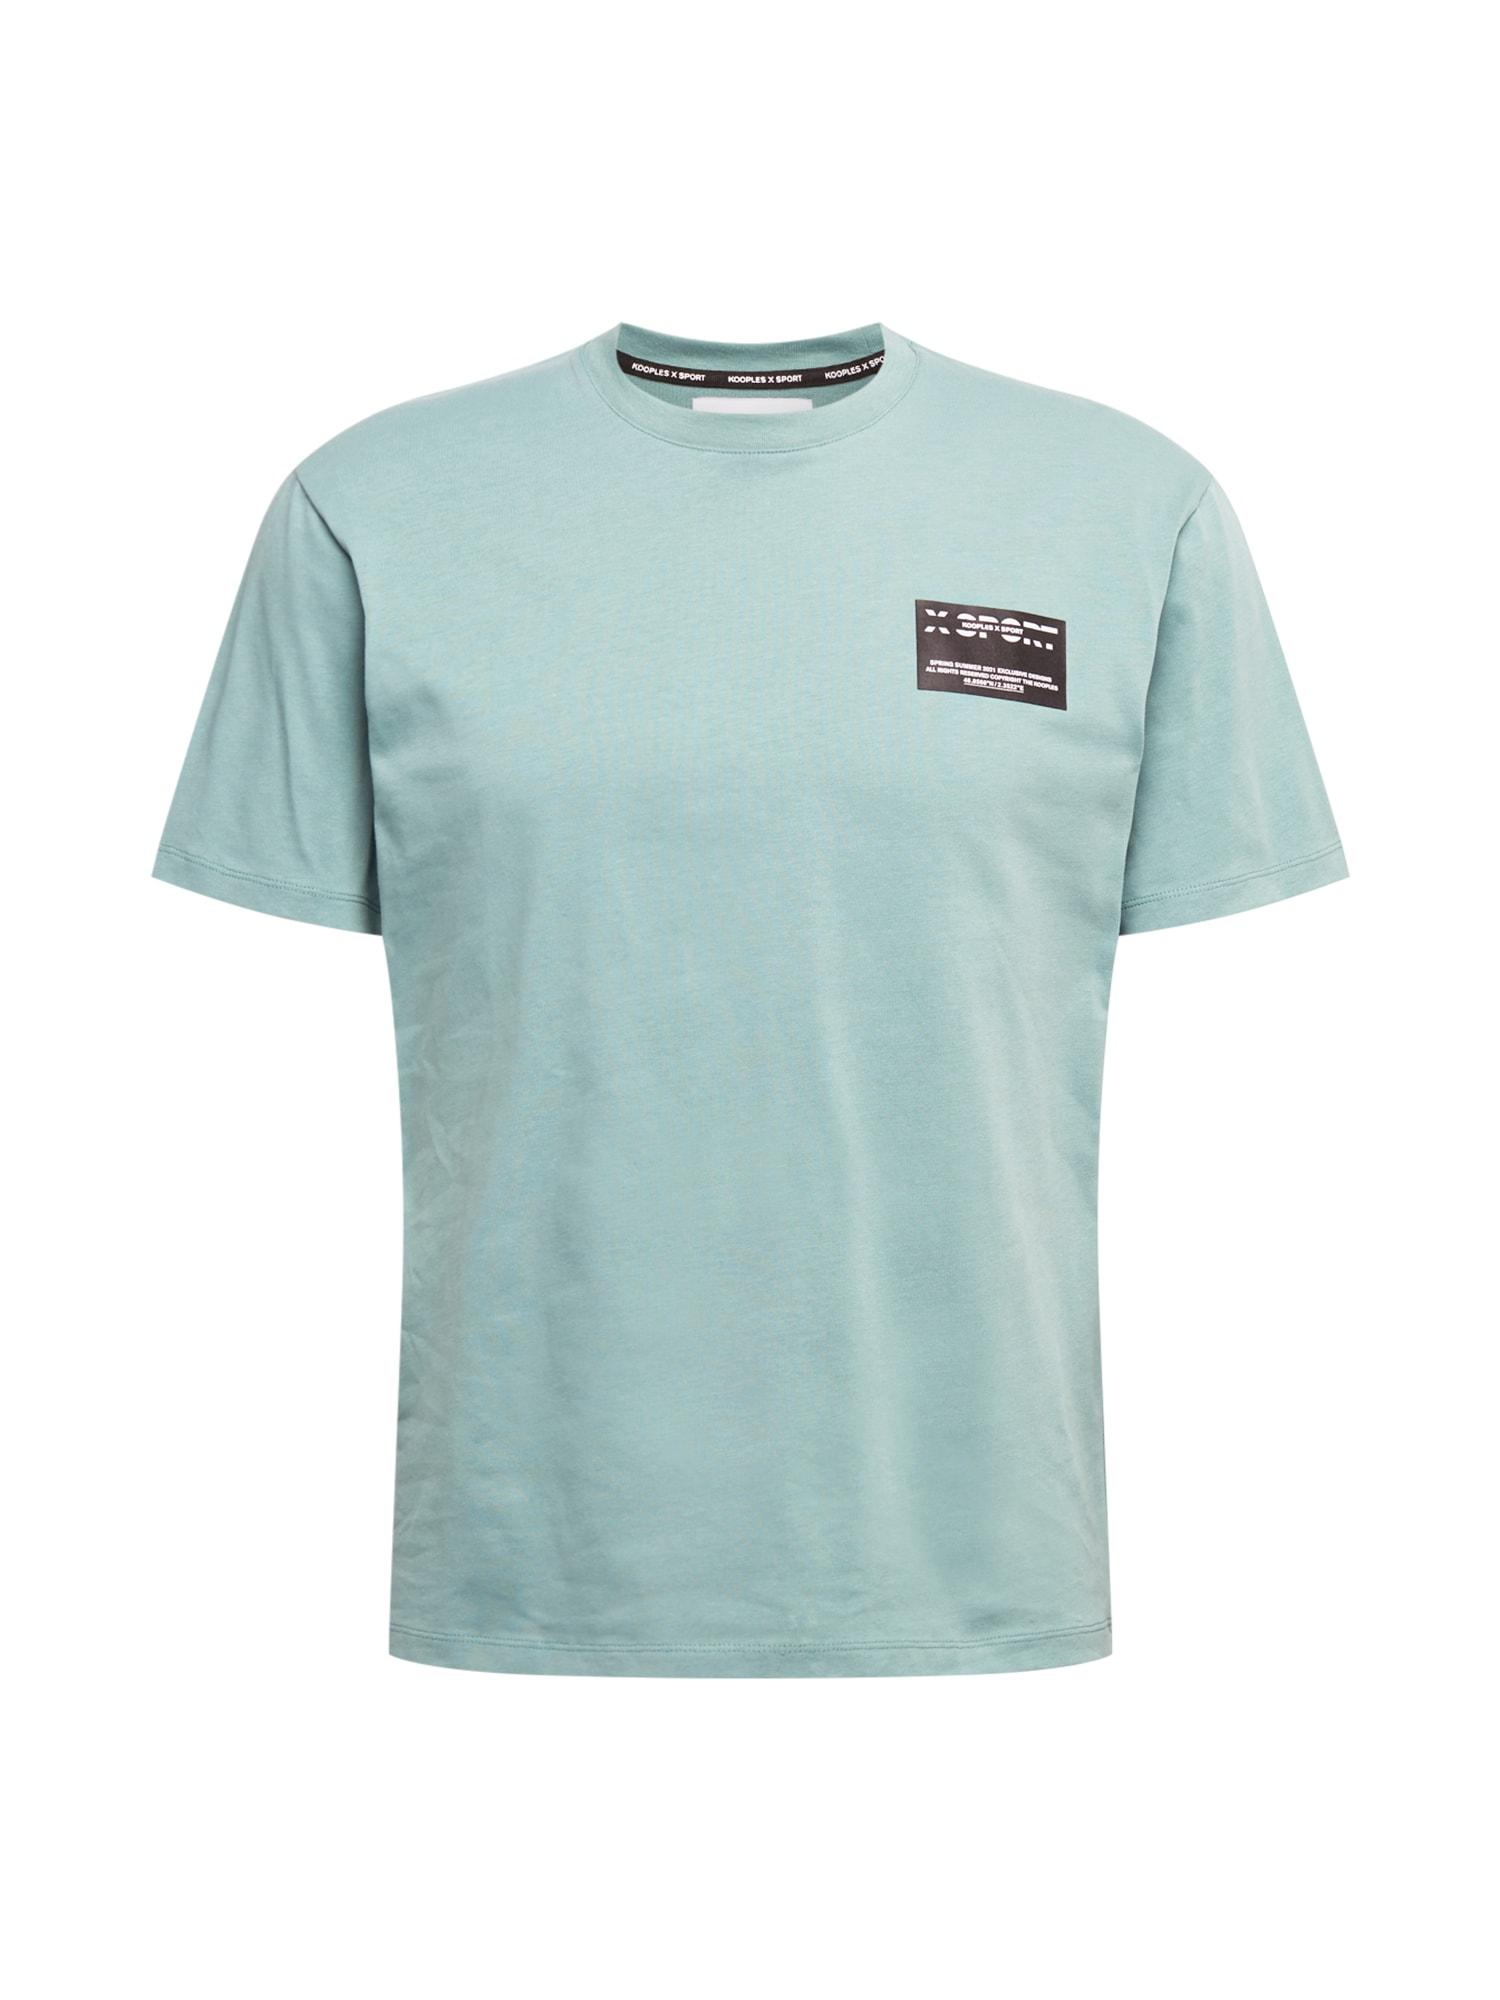 THE KOOPLES SPORT Marškinėliai mėlyna / juoda / balta